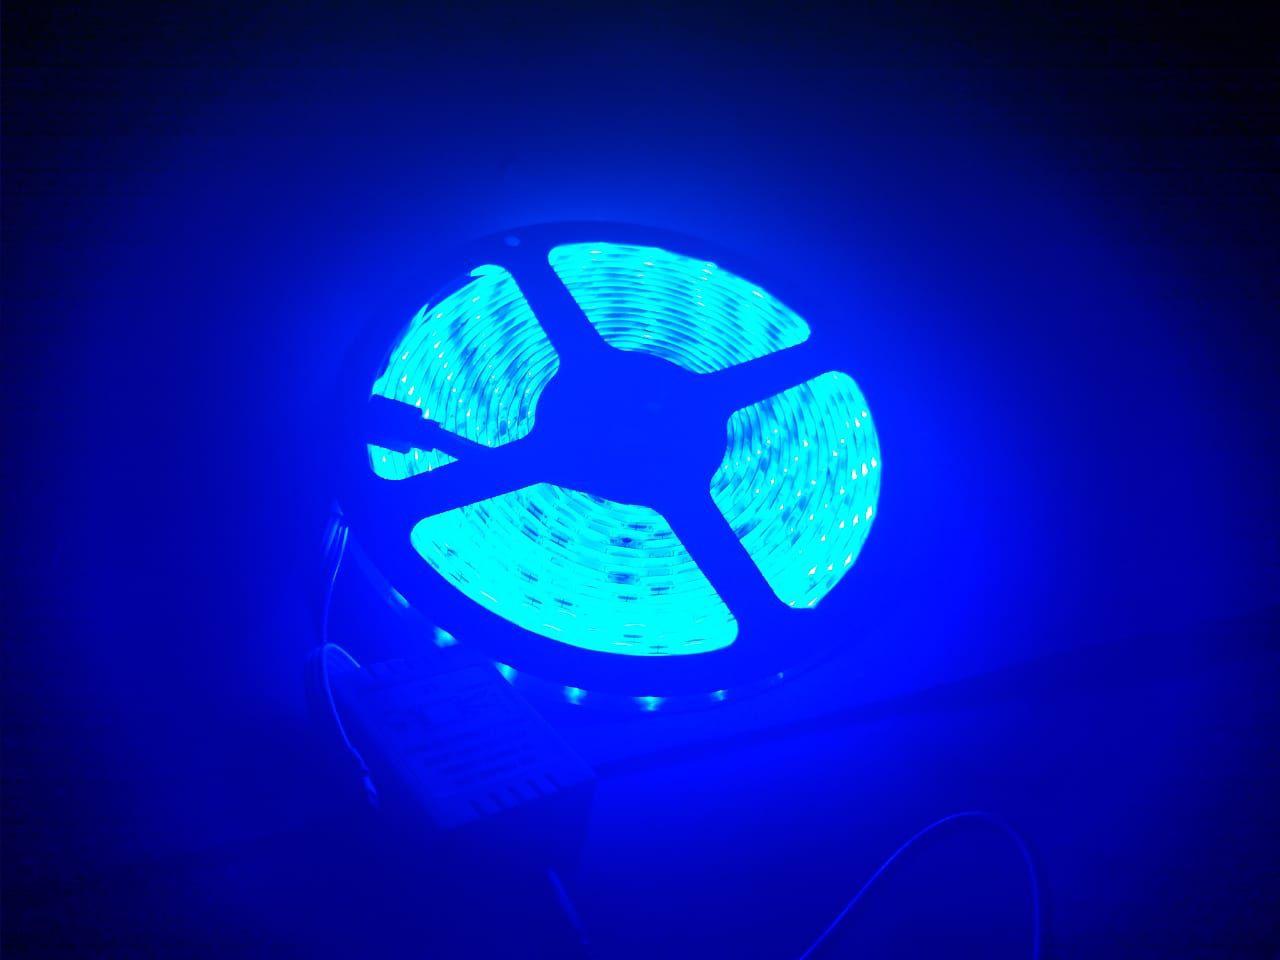 FITA DE LED RGB ADESIVA 5m 3528 IP65 (À Prova D'Água) c/ FONTE